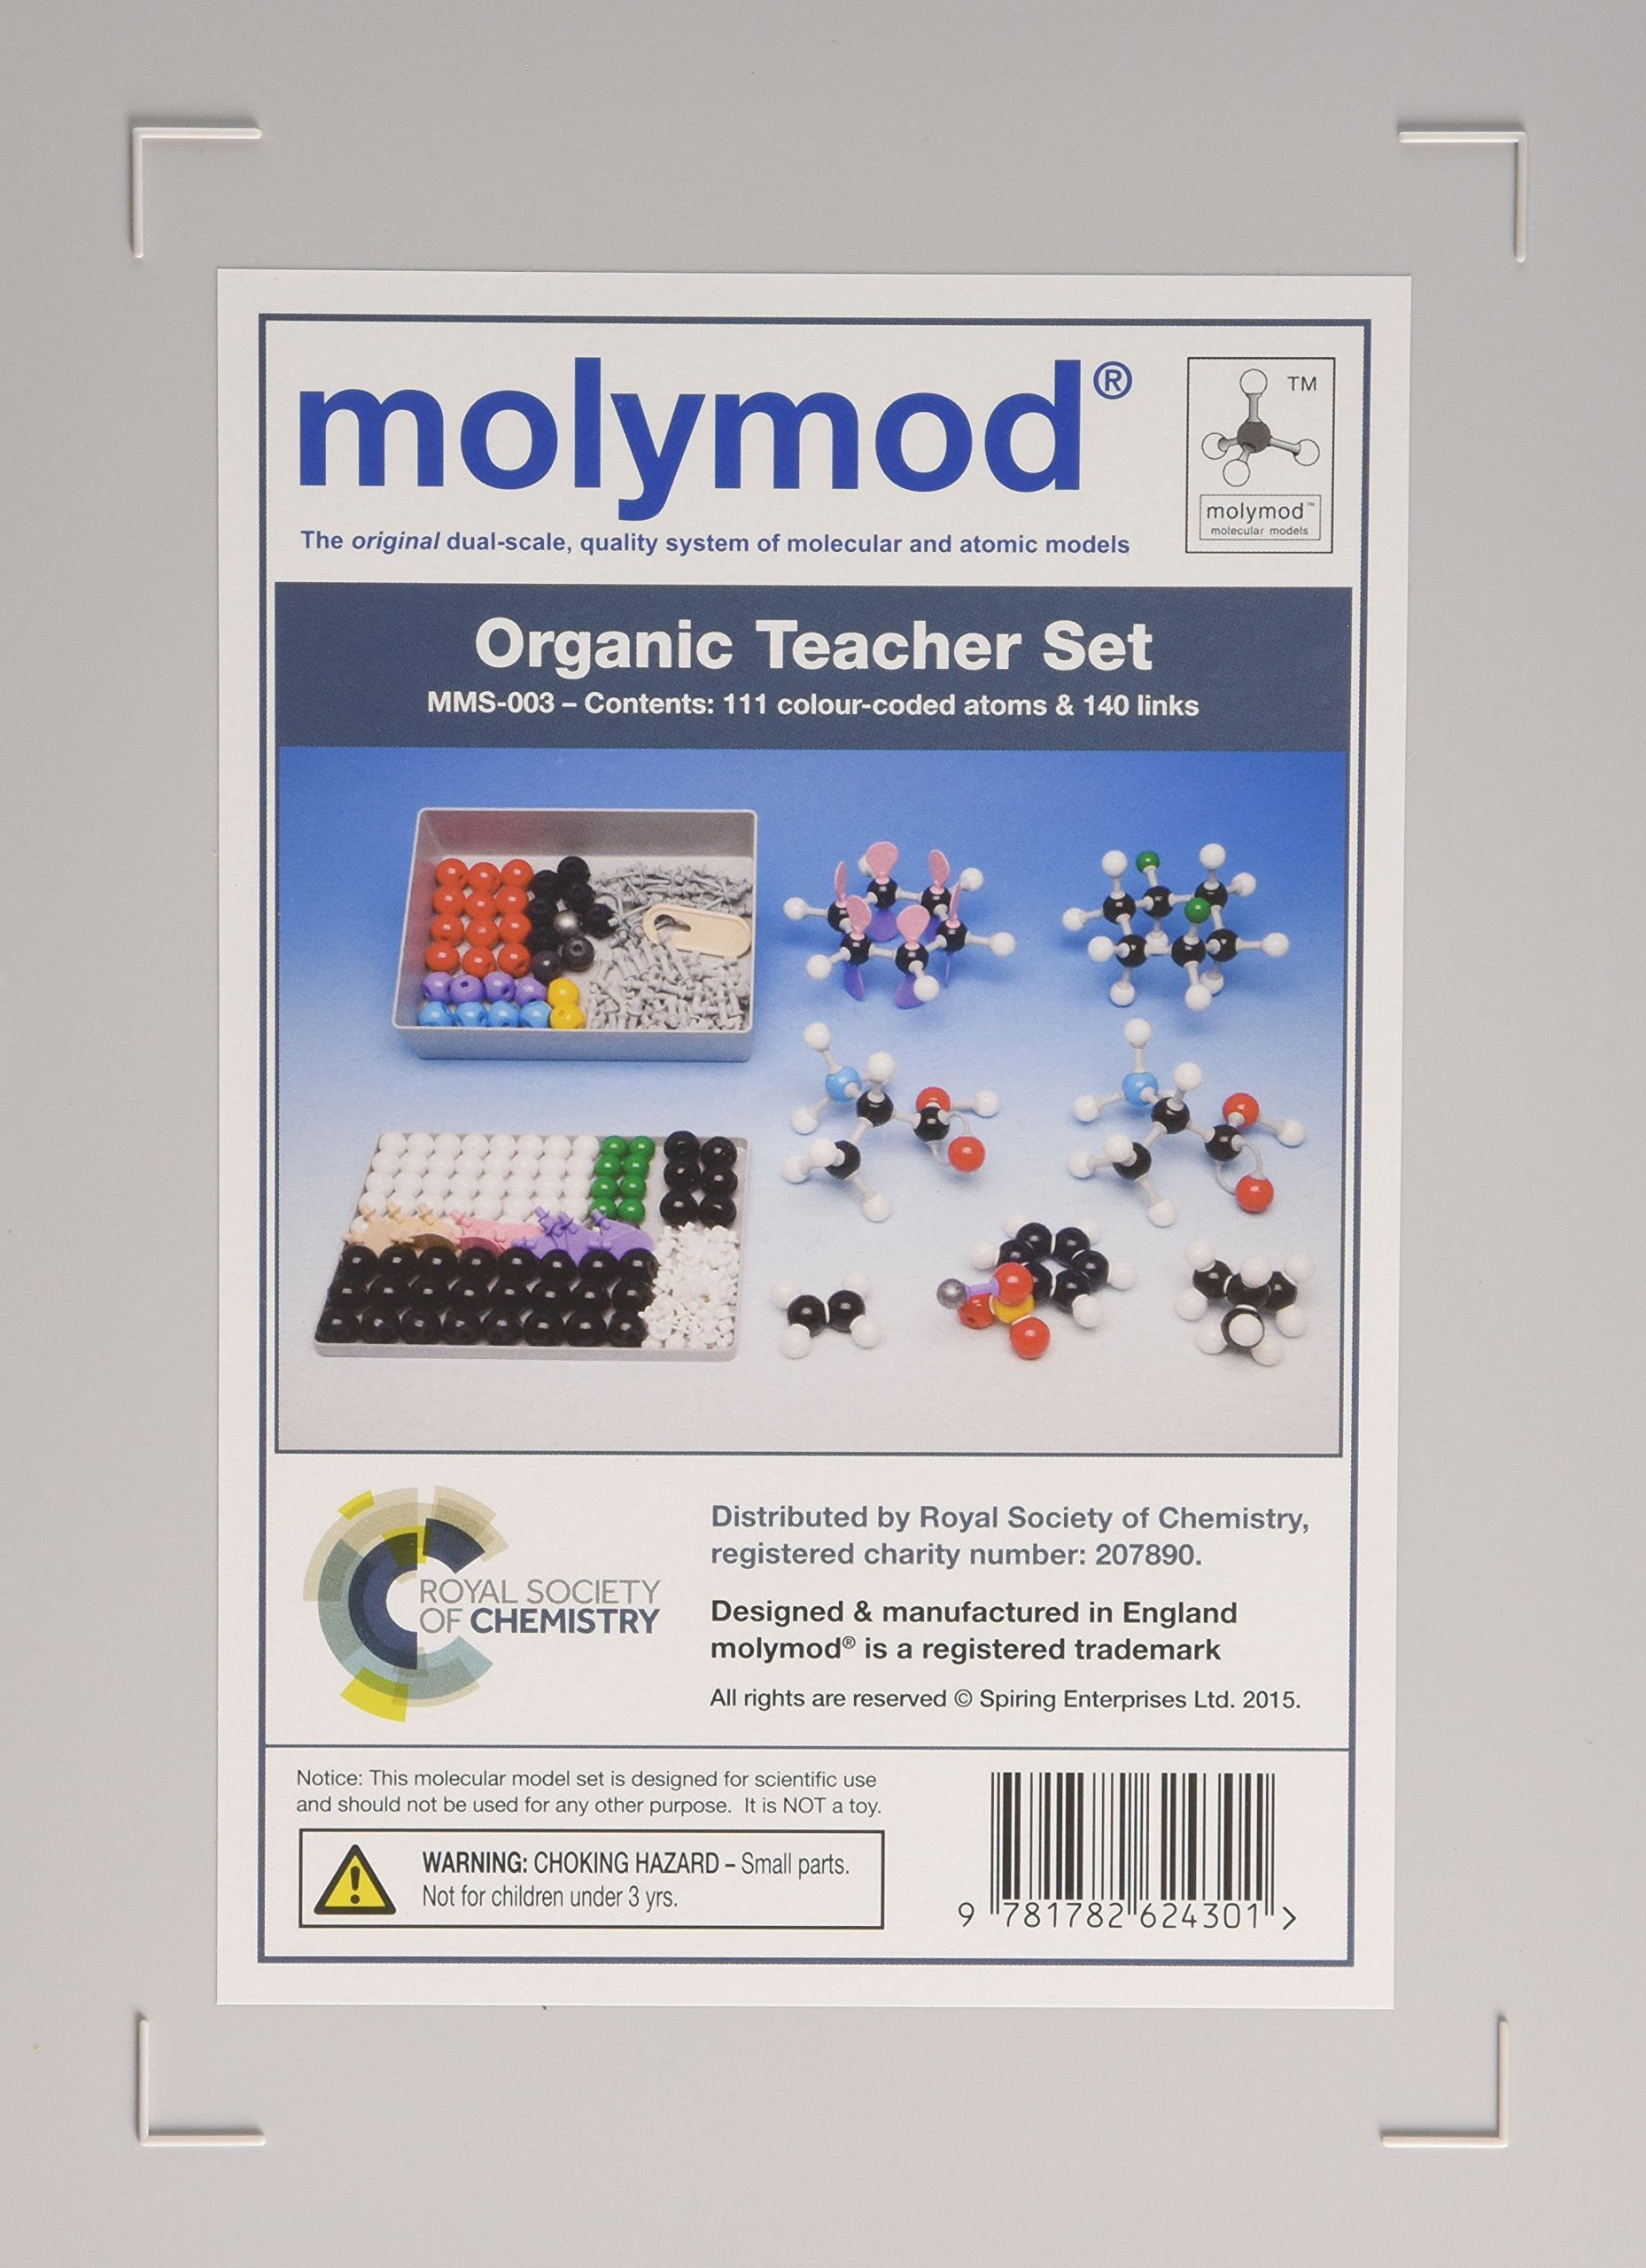 Molymod MMS-003: Organic Teacher 111 atom set